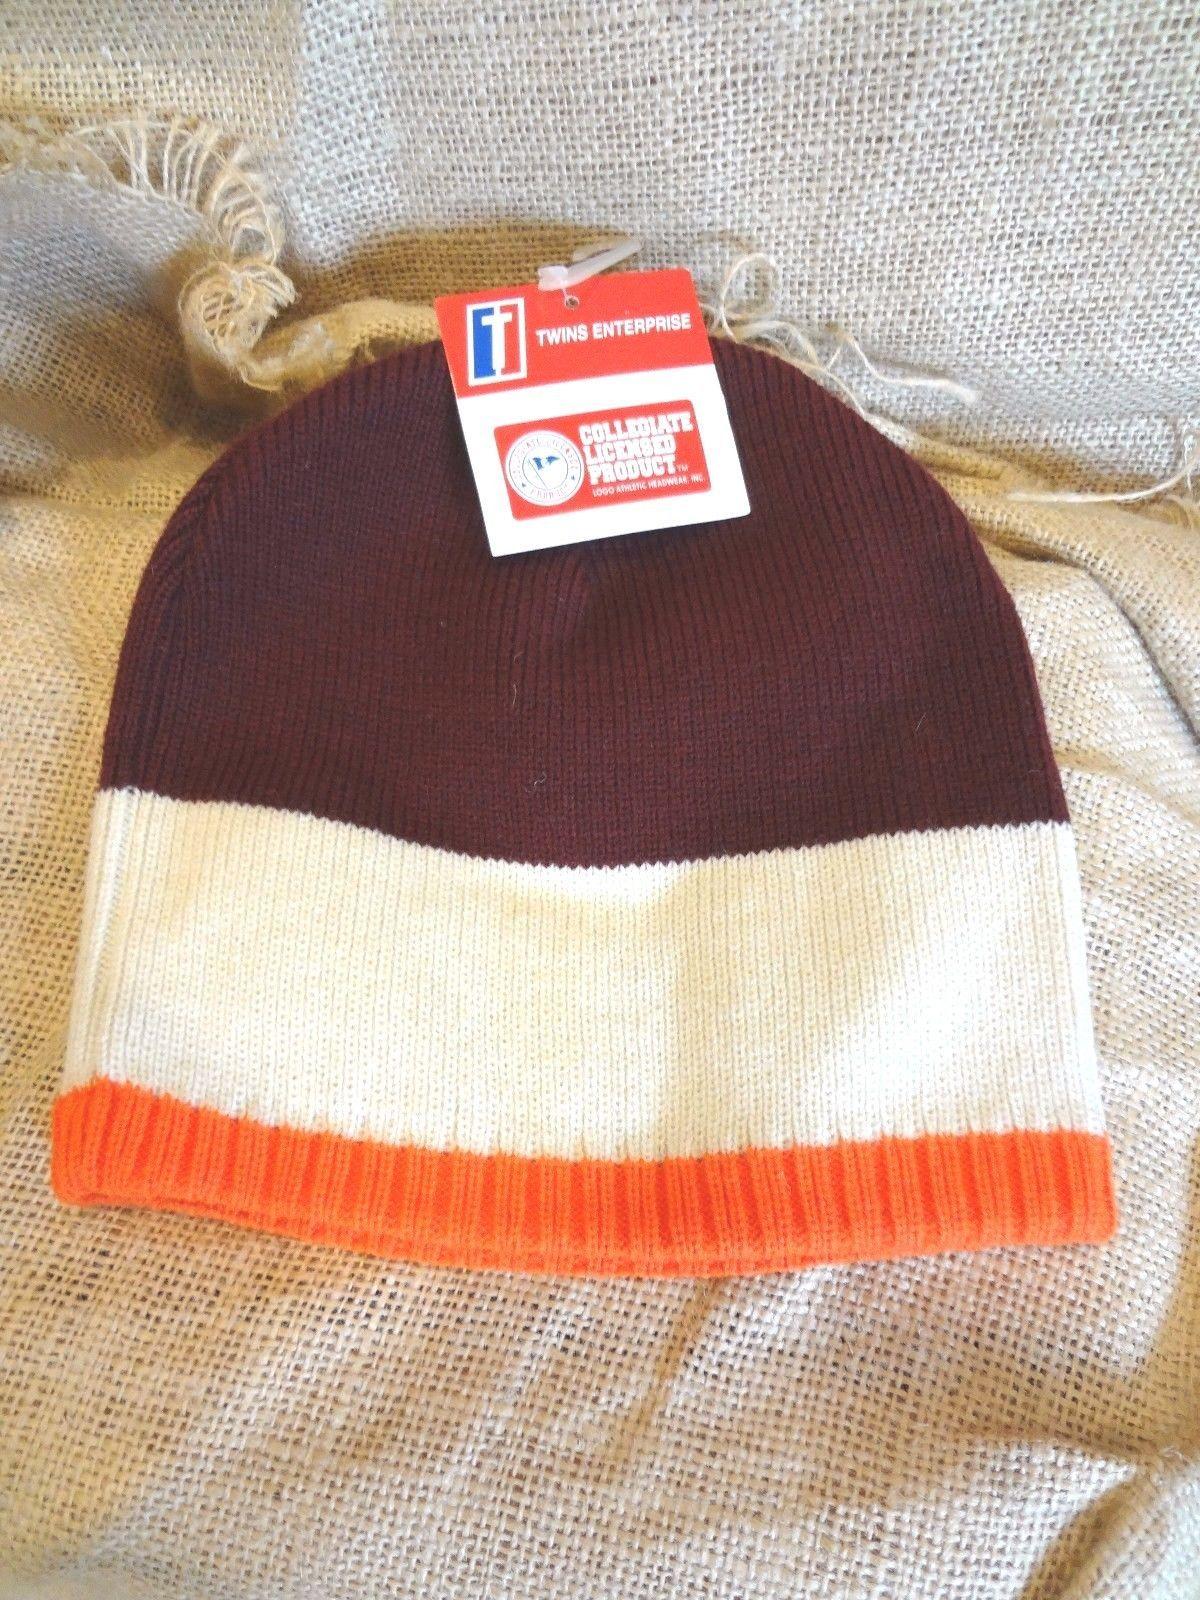 cb8b2d340 VIRGINIA TECH HOKIES ~ Orange Beige Maroon KNIT BEANIE SKULL HAT CAP~NWT